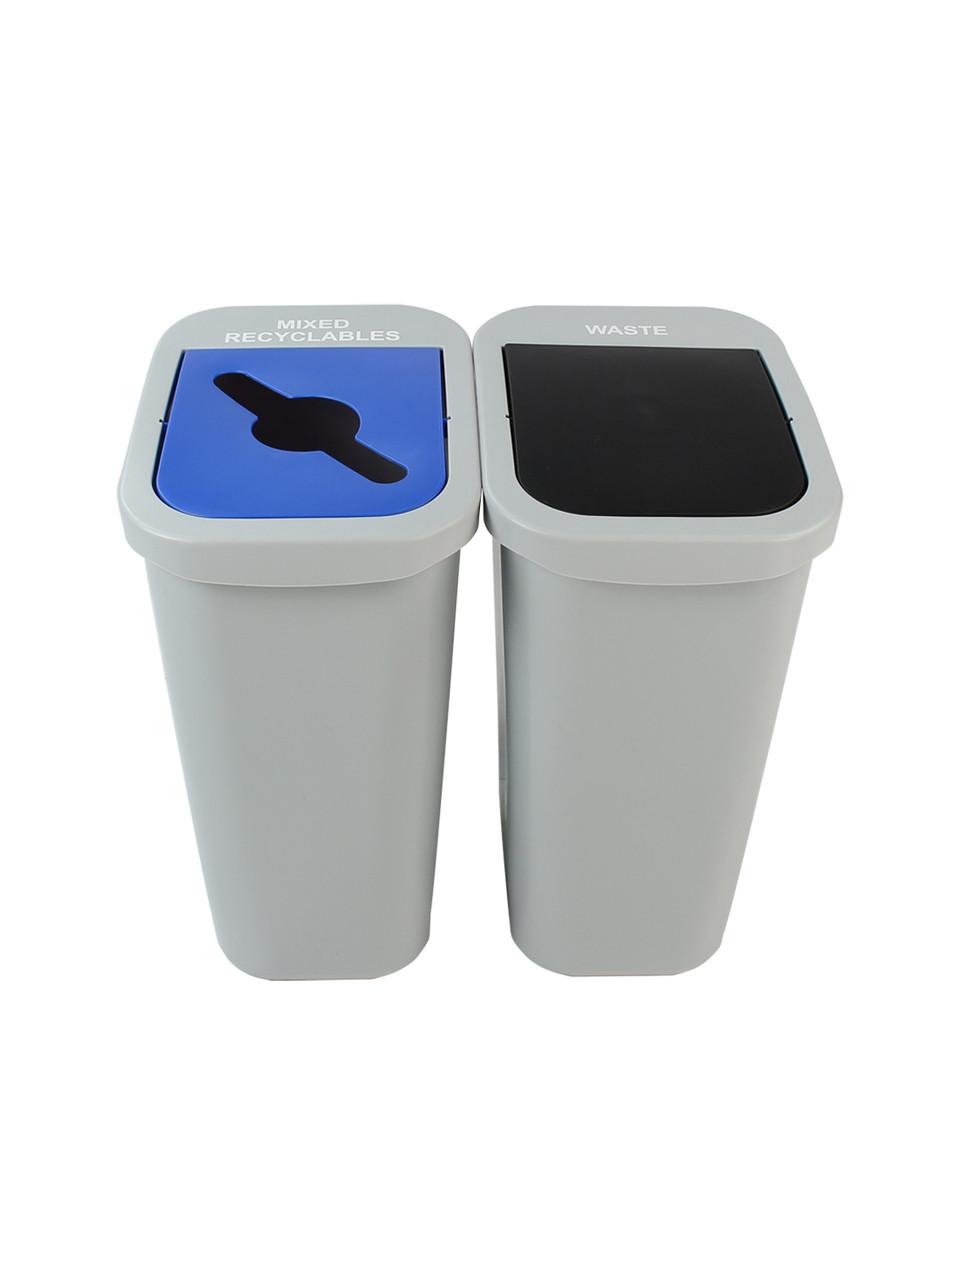 20 Gallon Billi Box Double Trash Can Recycle Bin Combo 8102026-24 (Mixed, Waste Swing Lid)